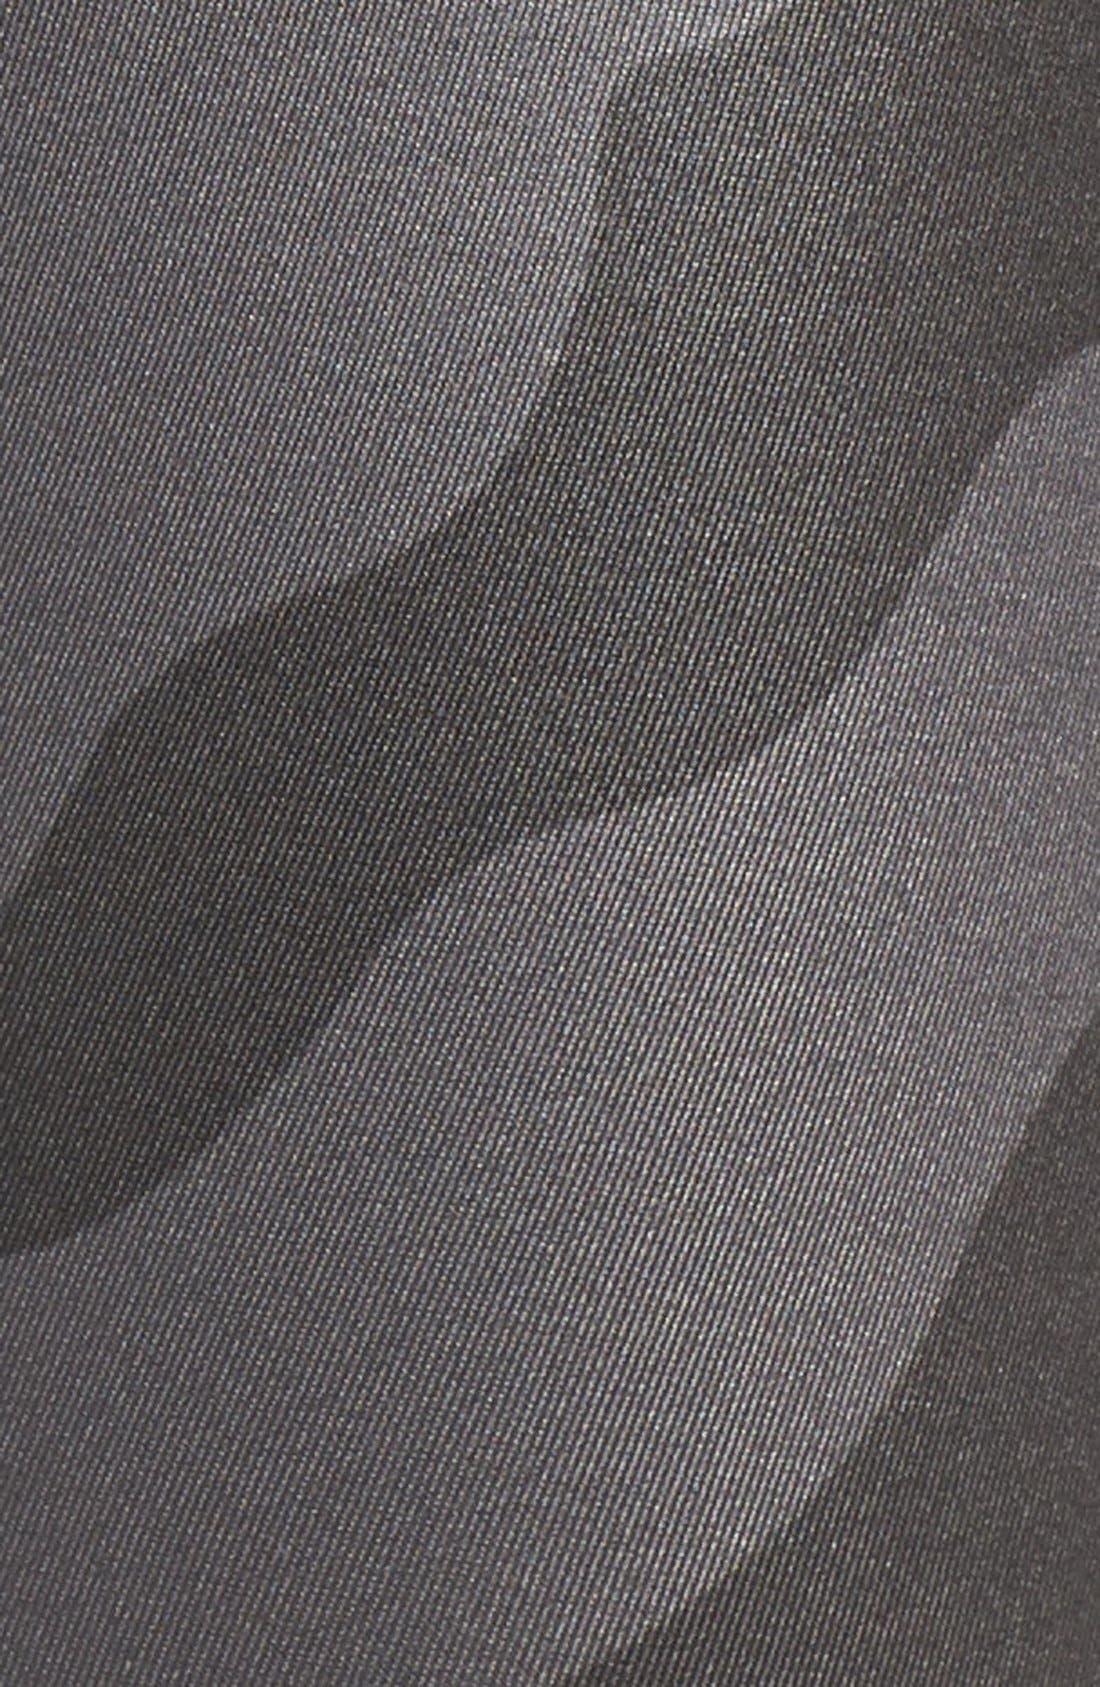 'Airbrushed' Leggings,                             Alternate thumbnail 172, color,